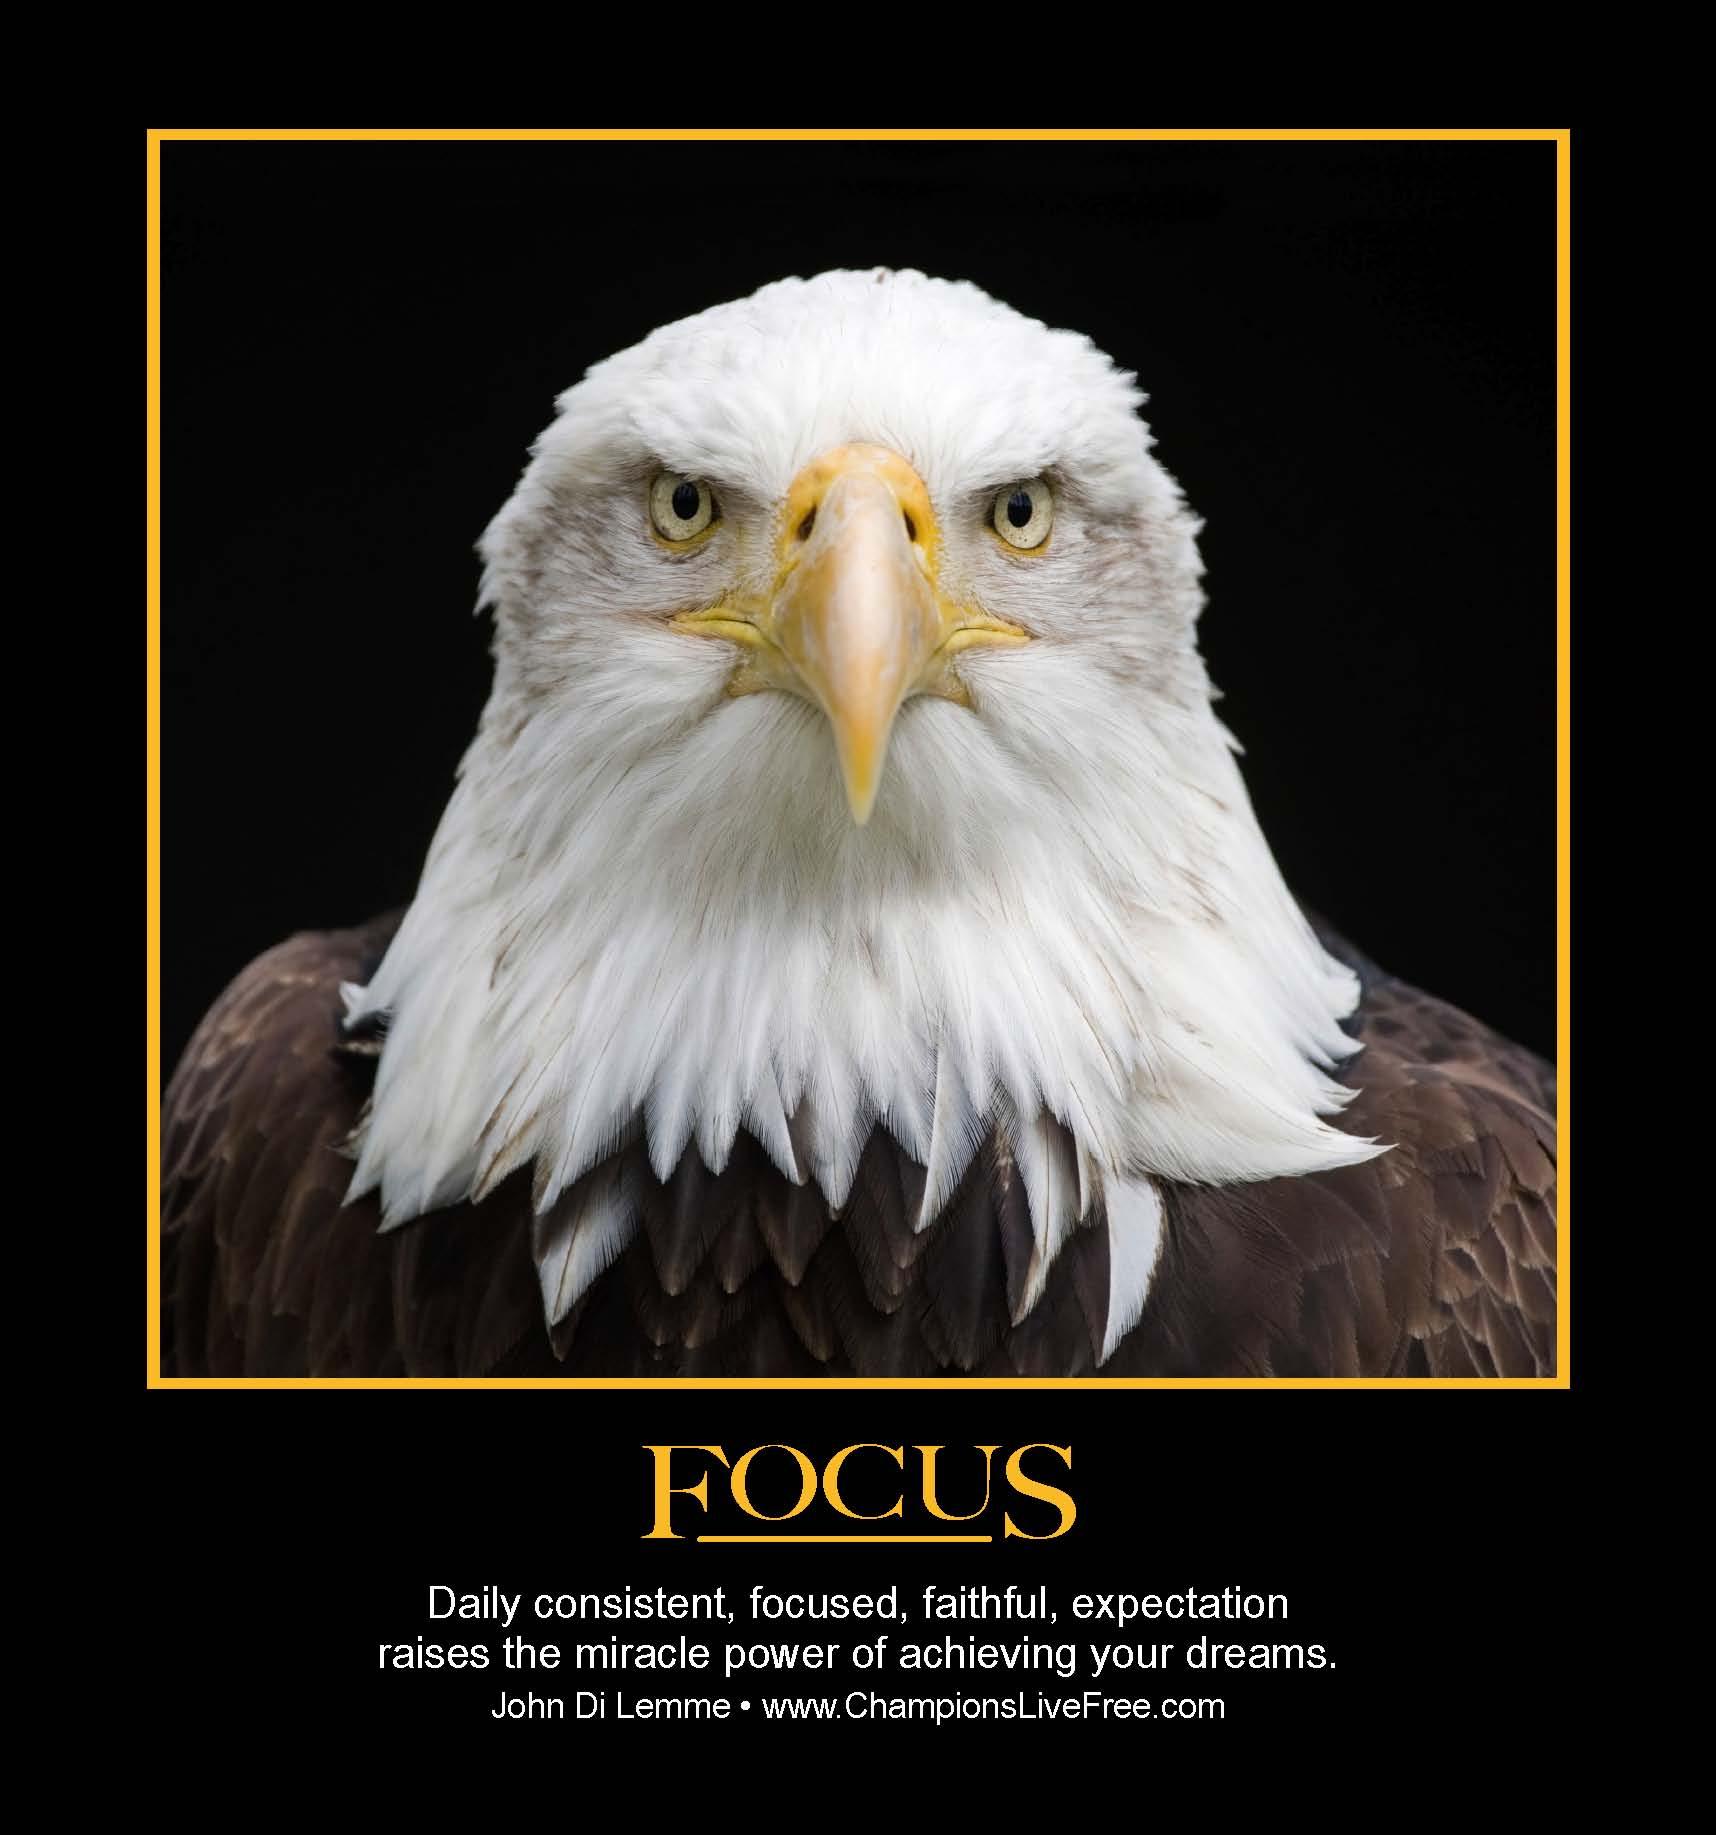 Inspirational Day Quotes: Focus On Success Quotes. QuotesGram